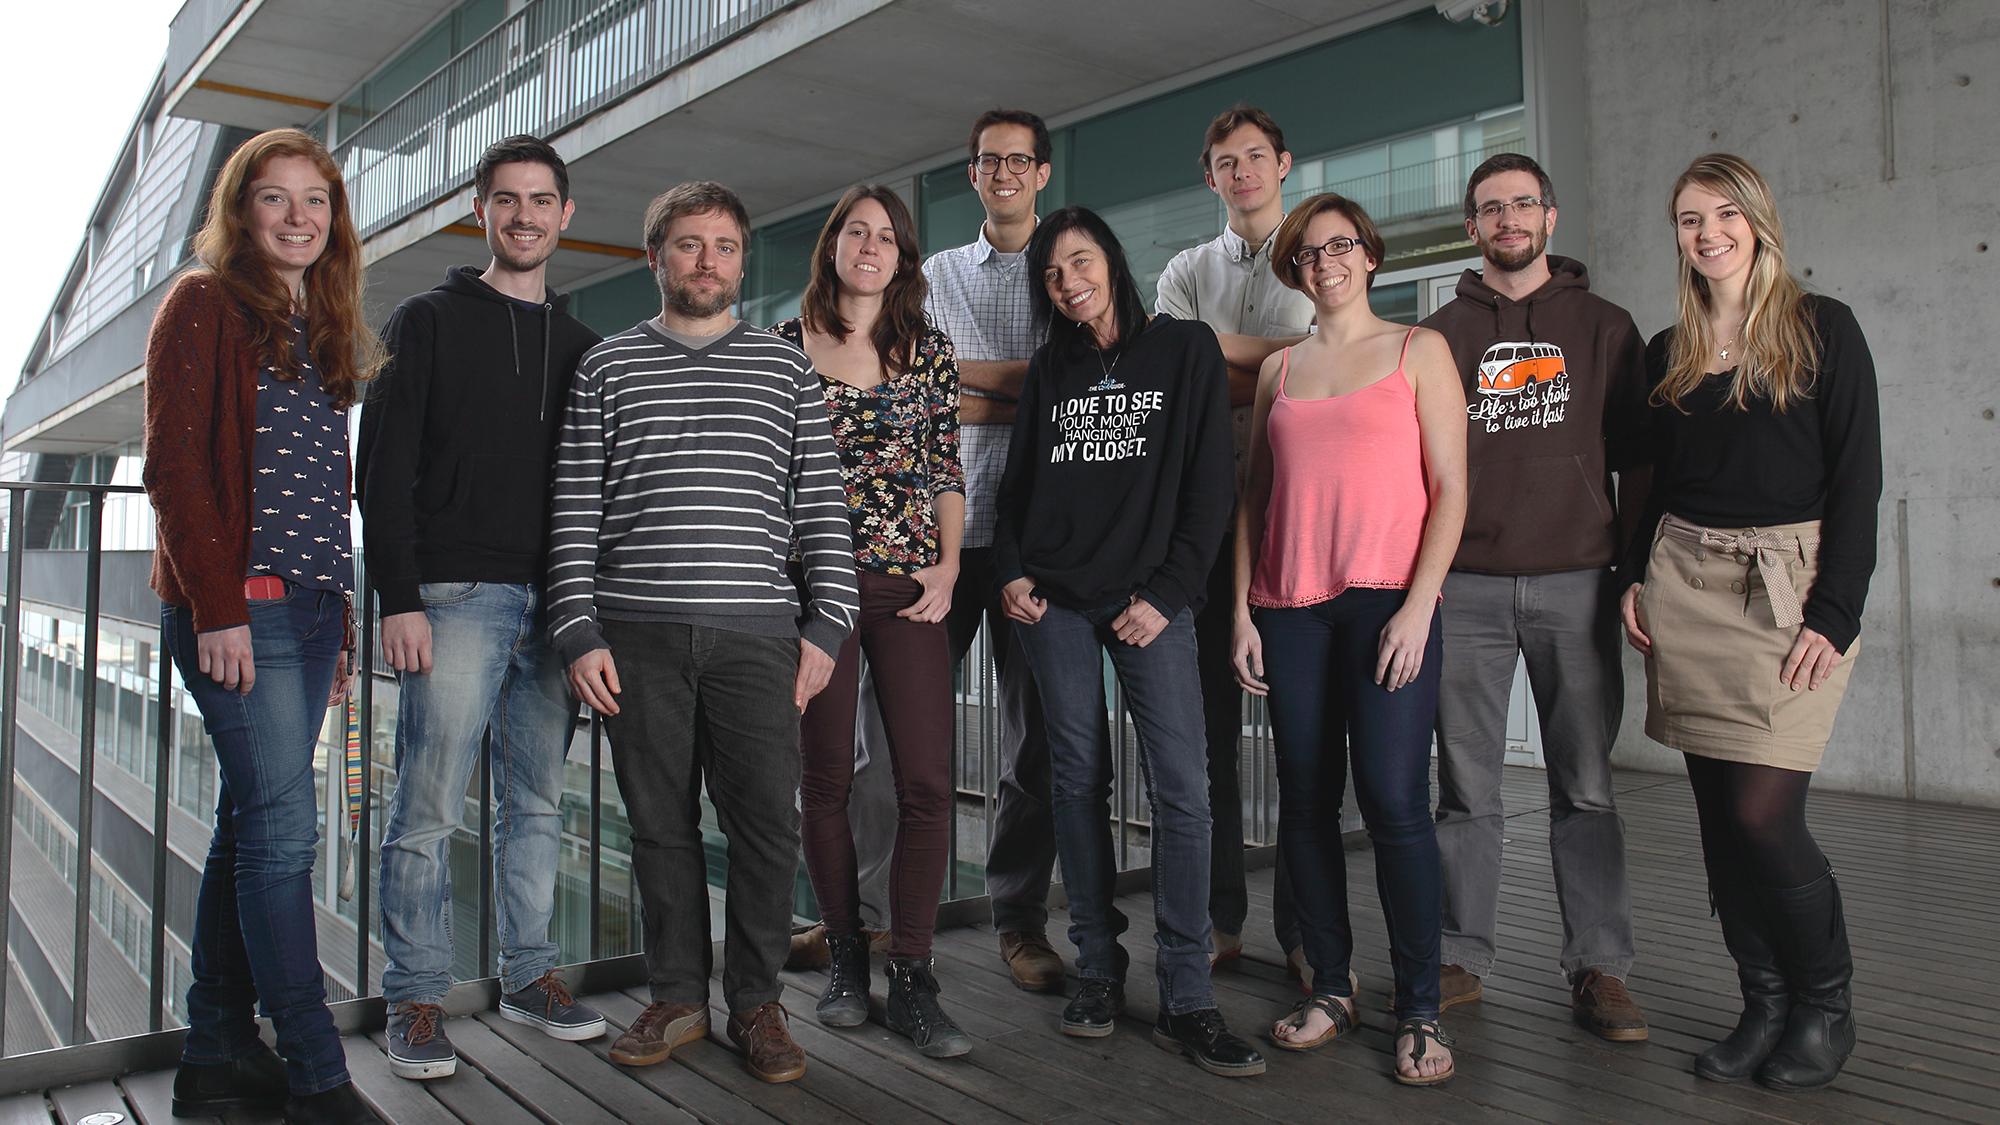 Dierssen Lab at CRG is an interdisciplinary team of nine people.